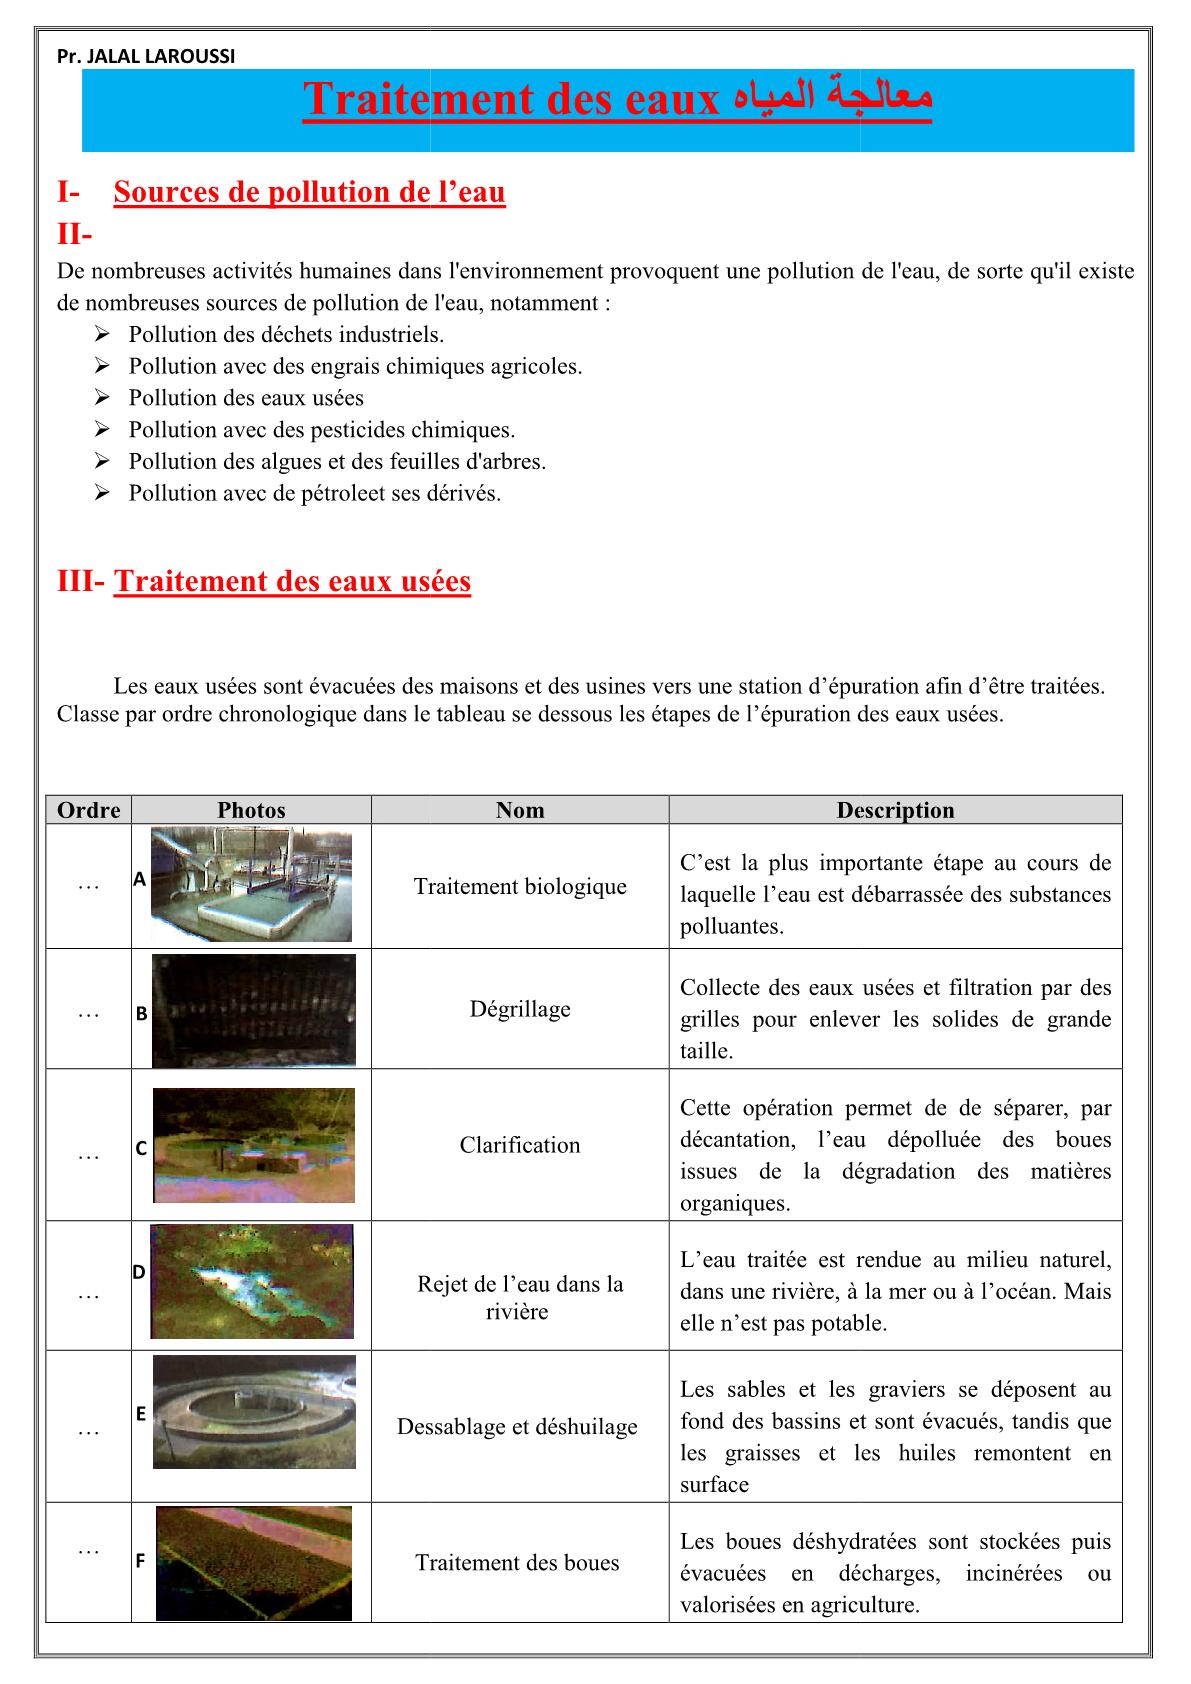 درس Le traitement des eaux للسنة الأولى اعدادي